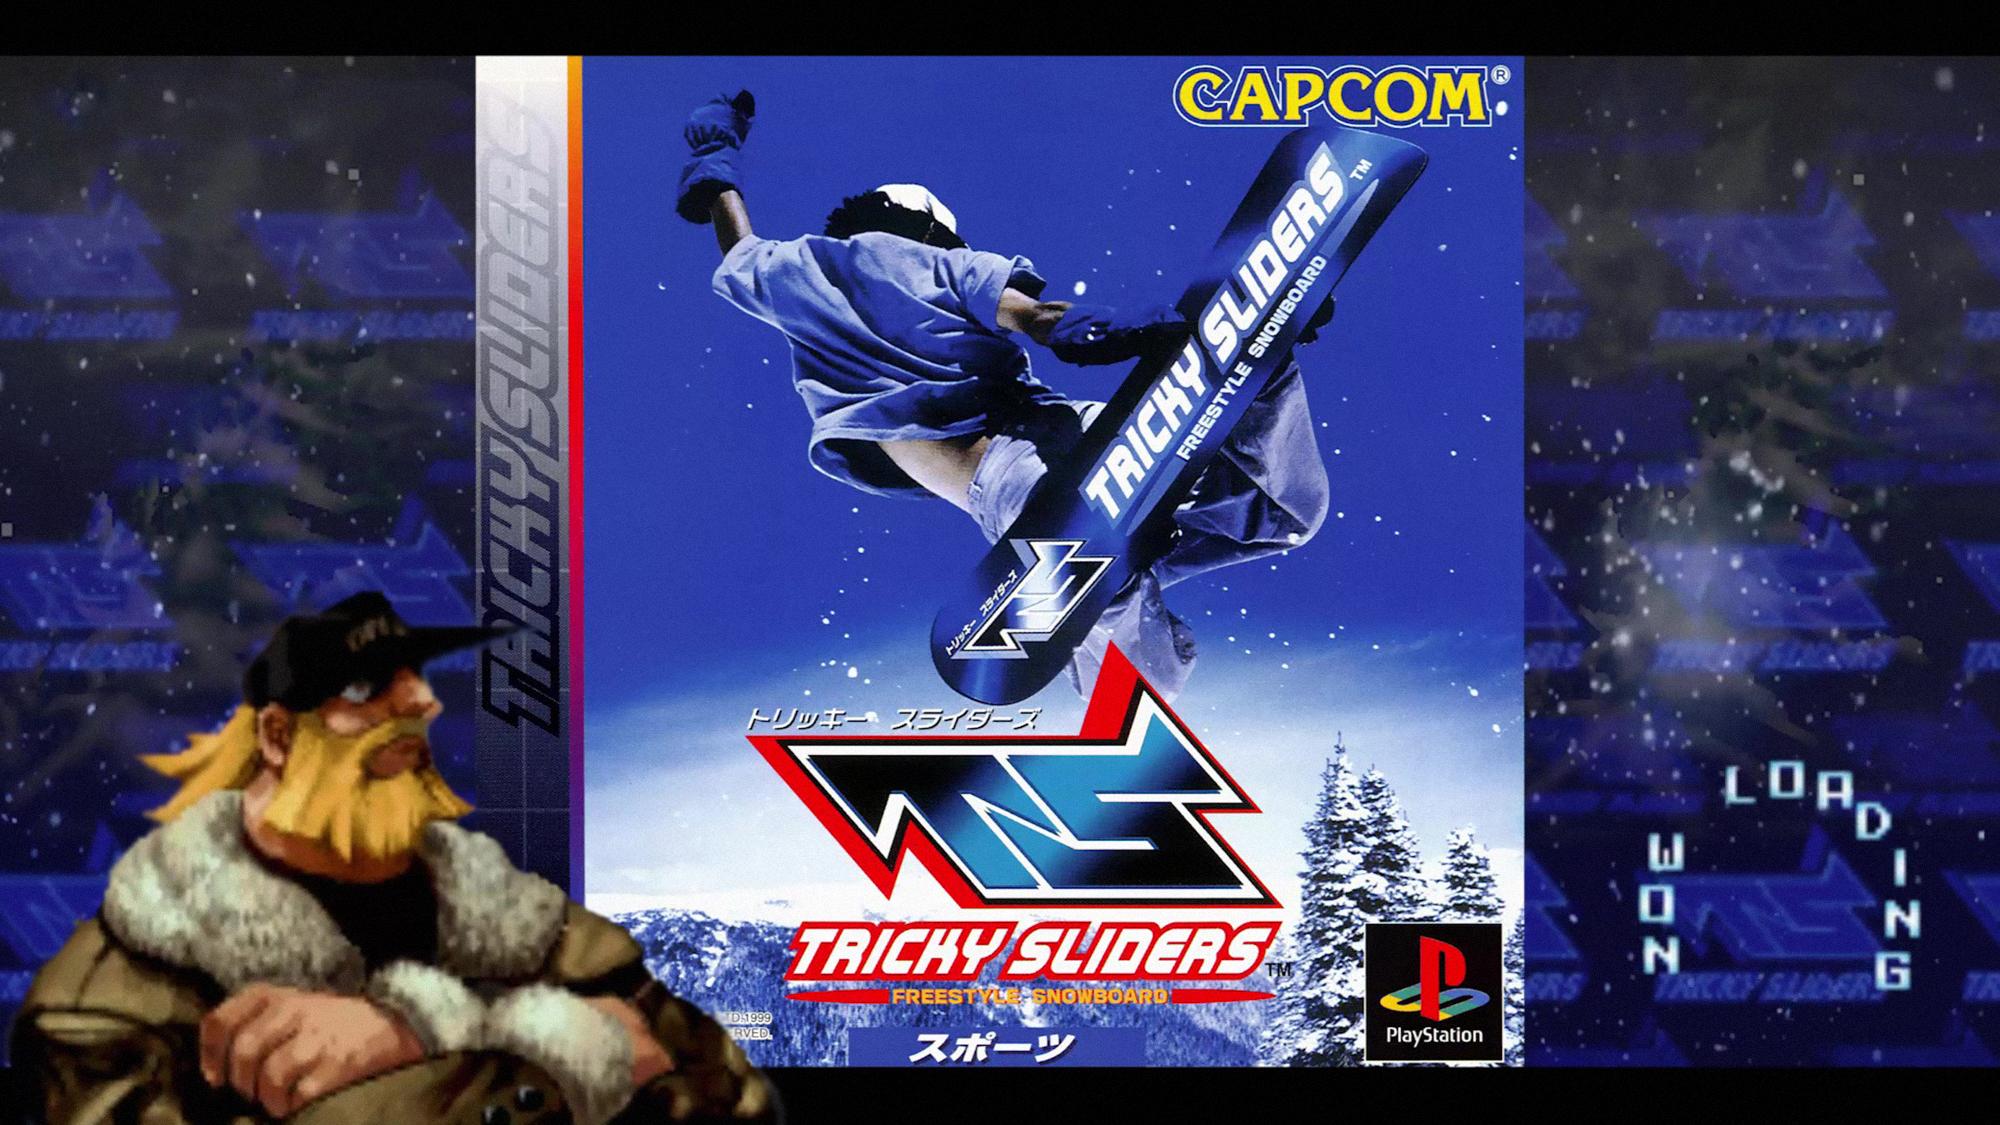 Capcom's Tricky Sliders by marblegallery7